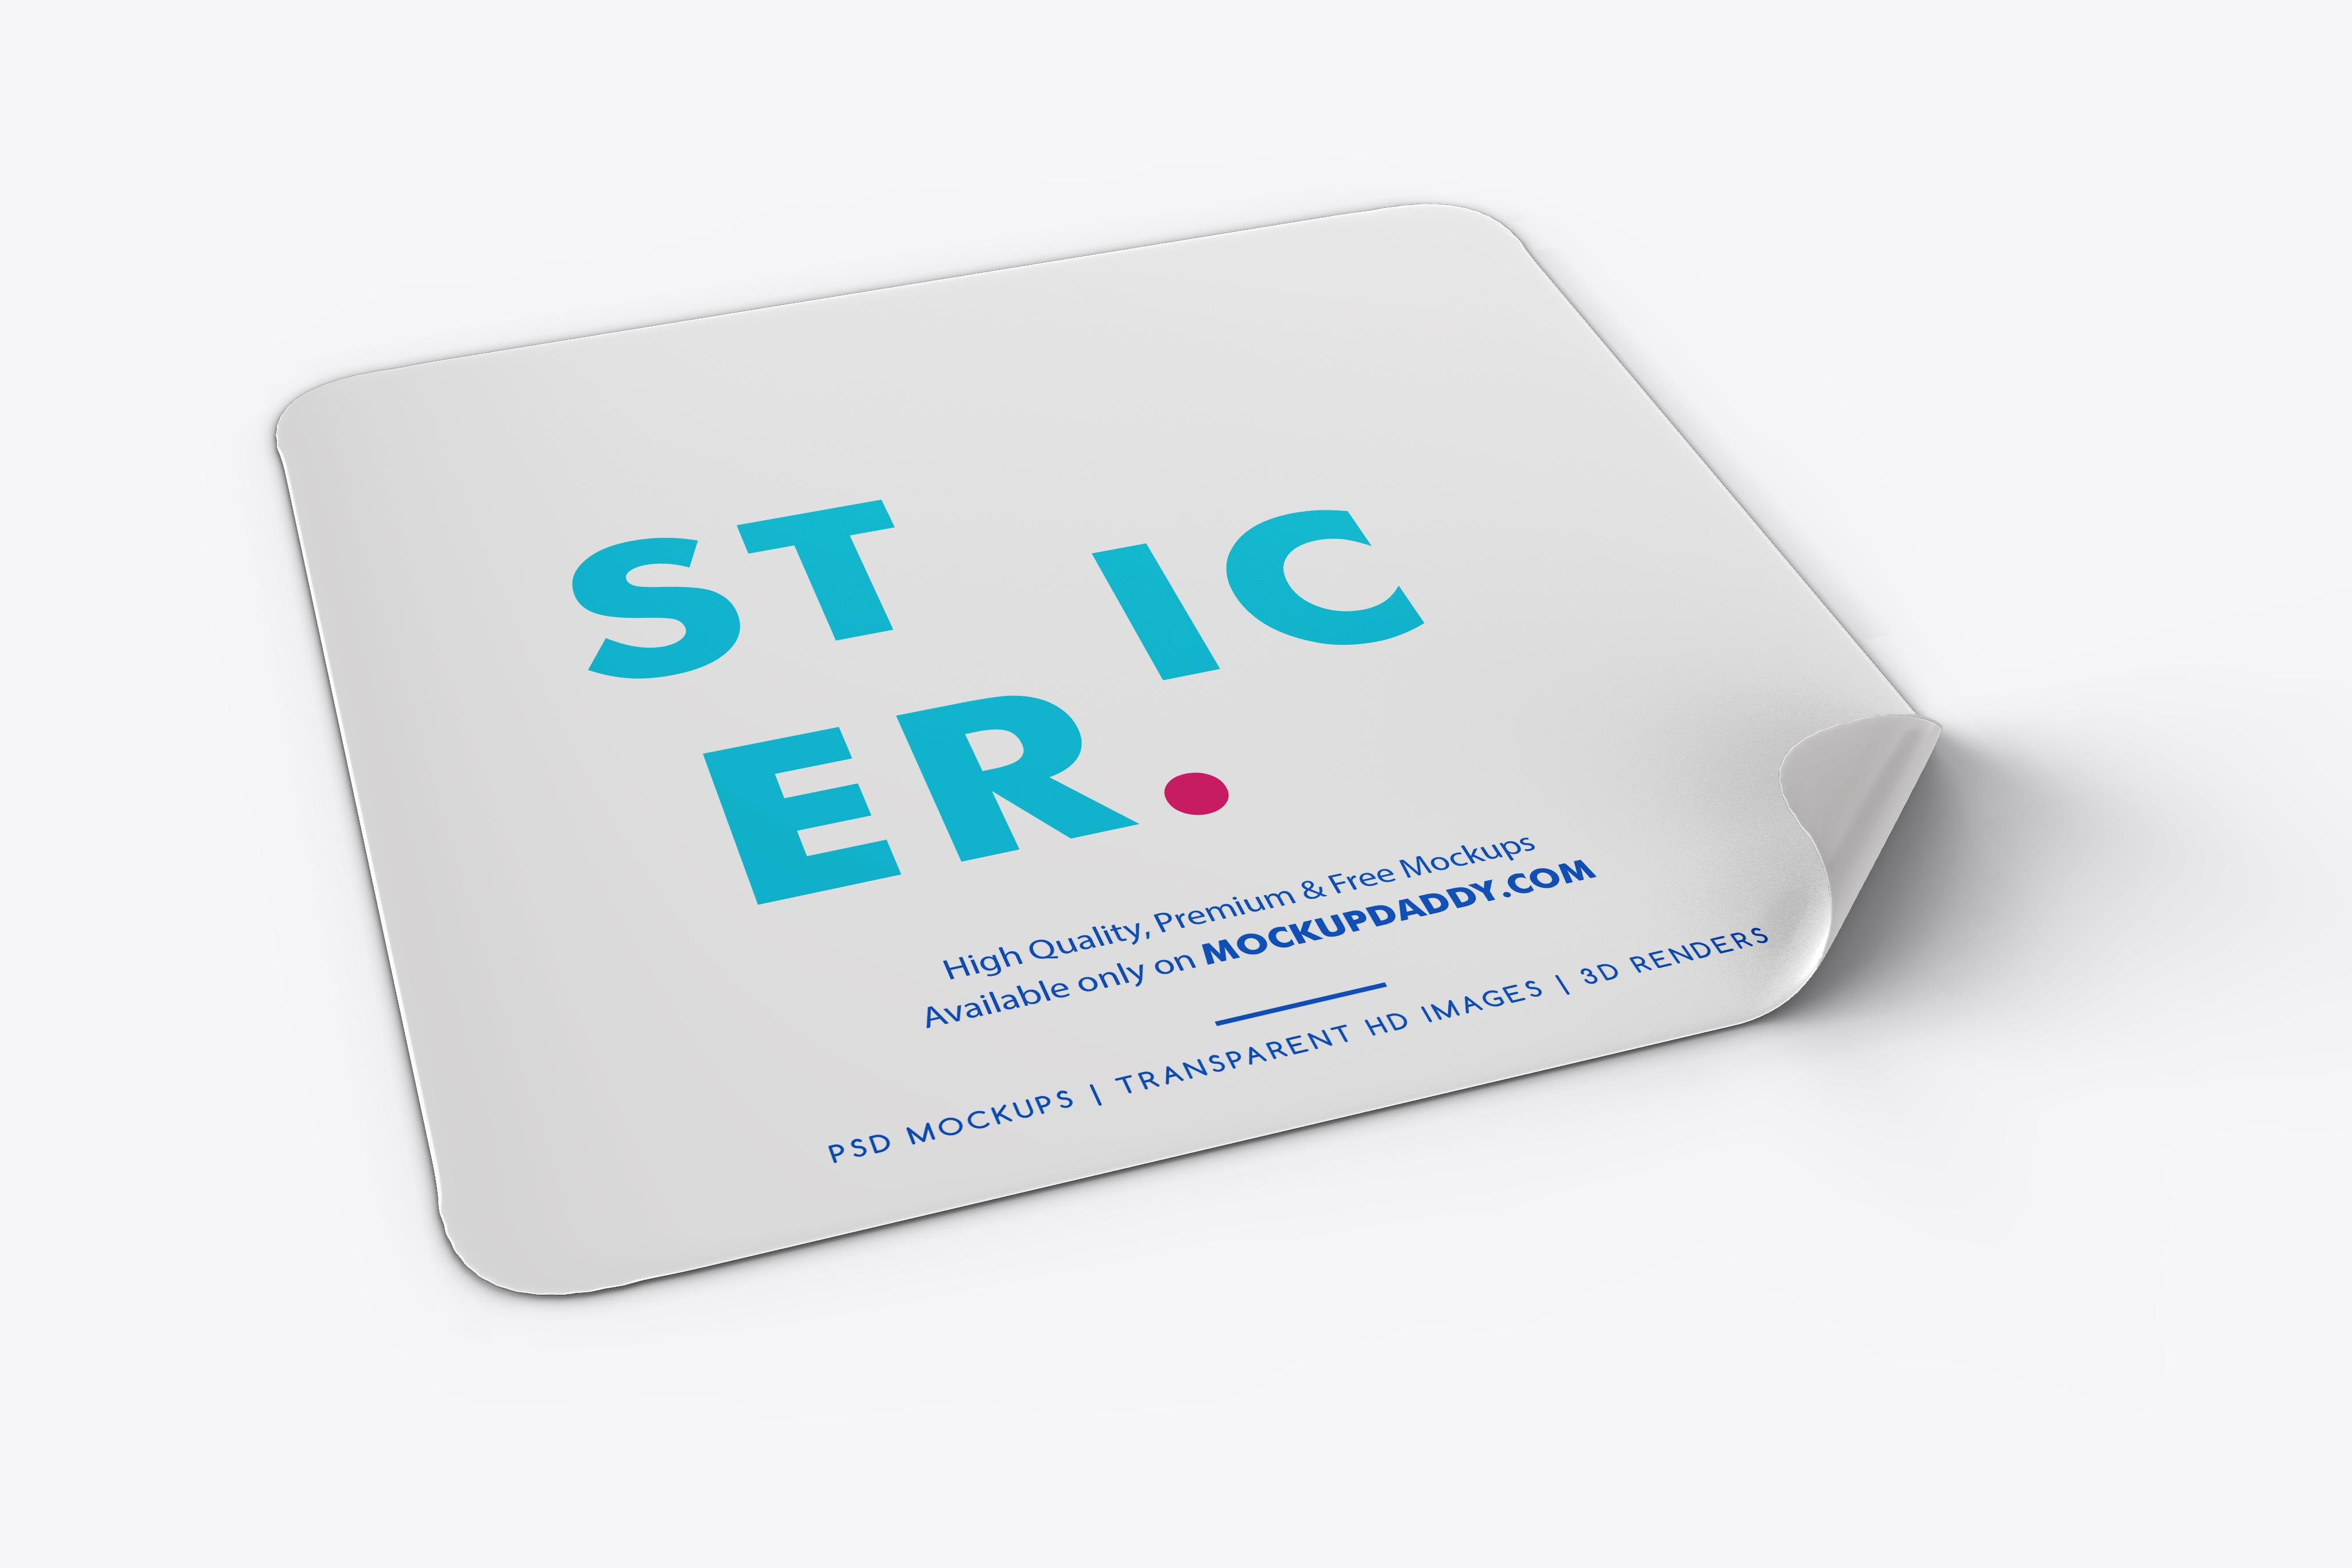 Square Adhesive Sticker Mockup